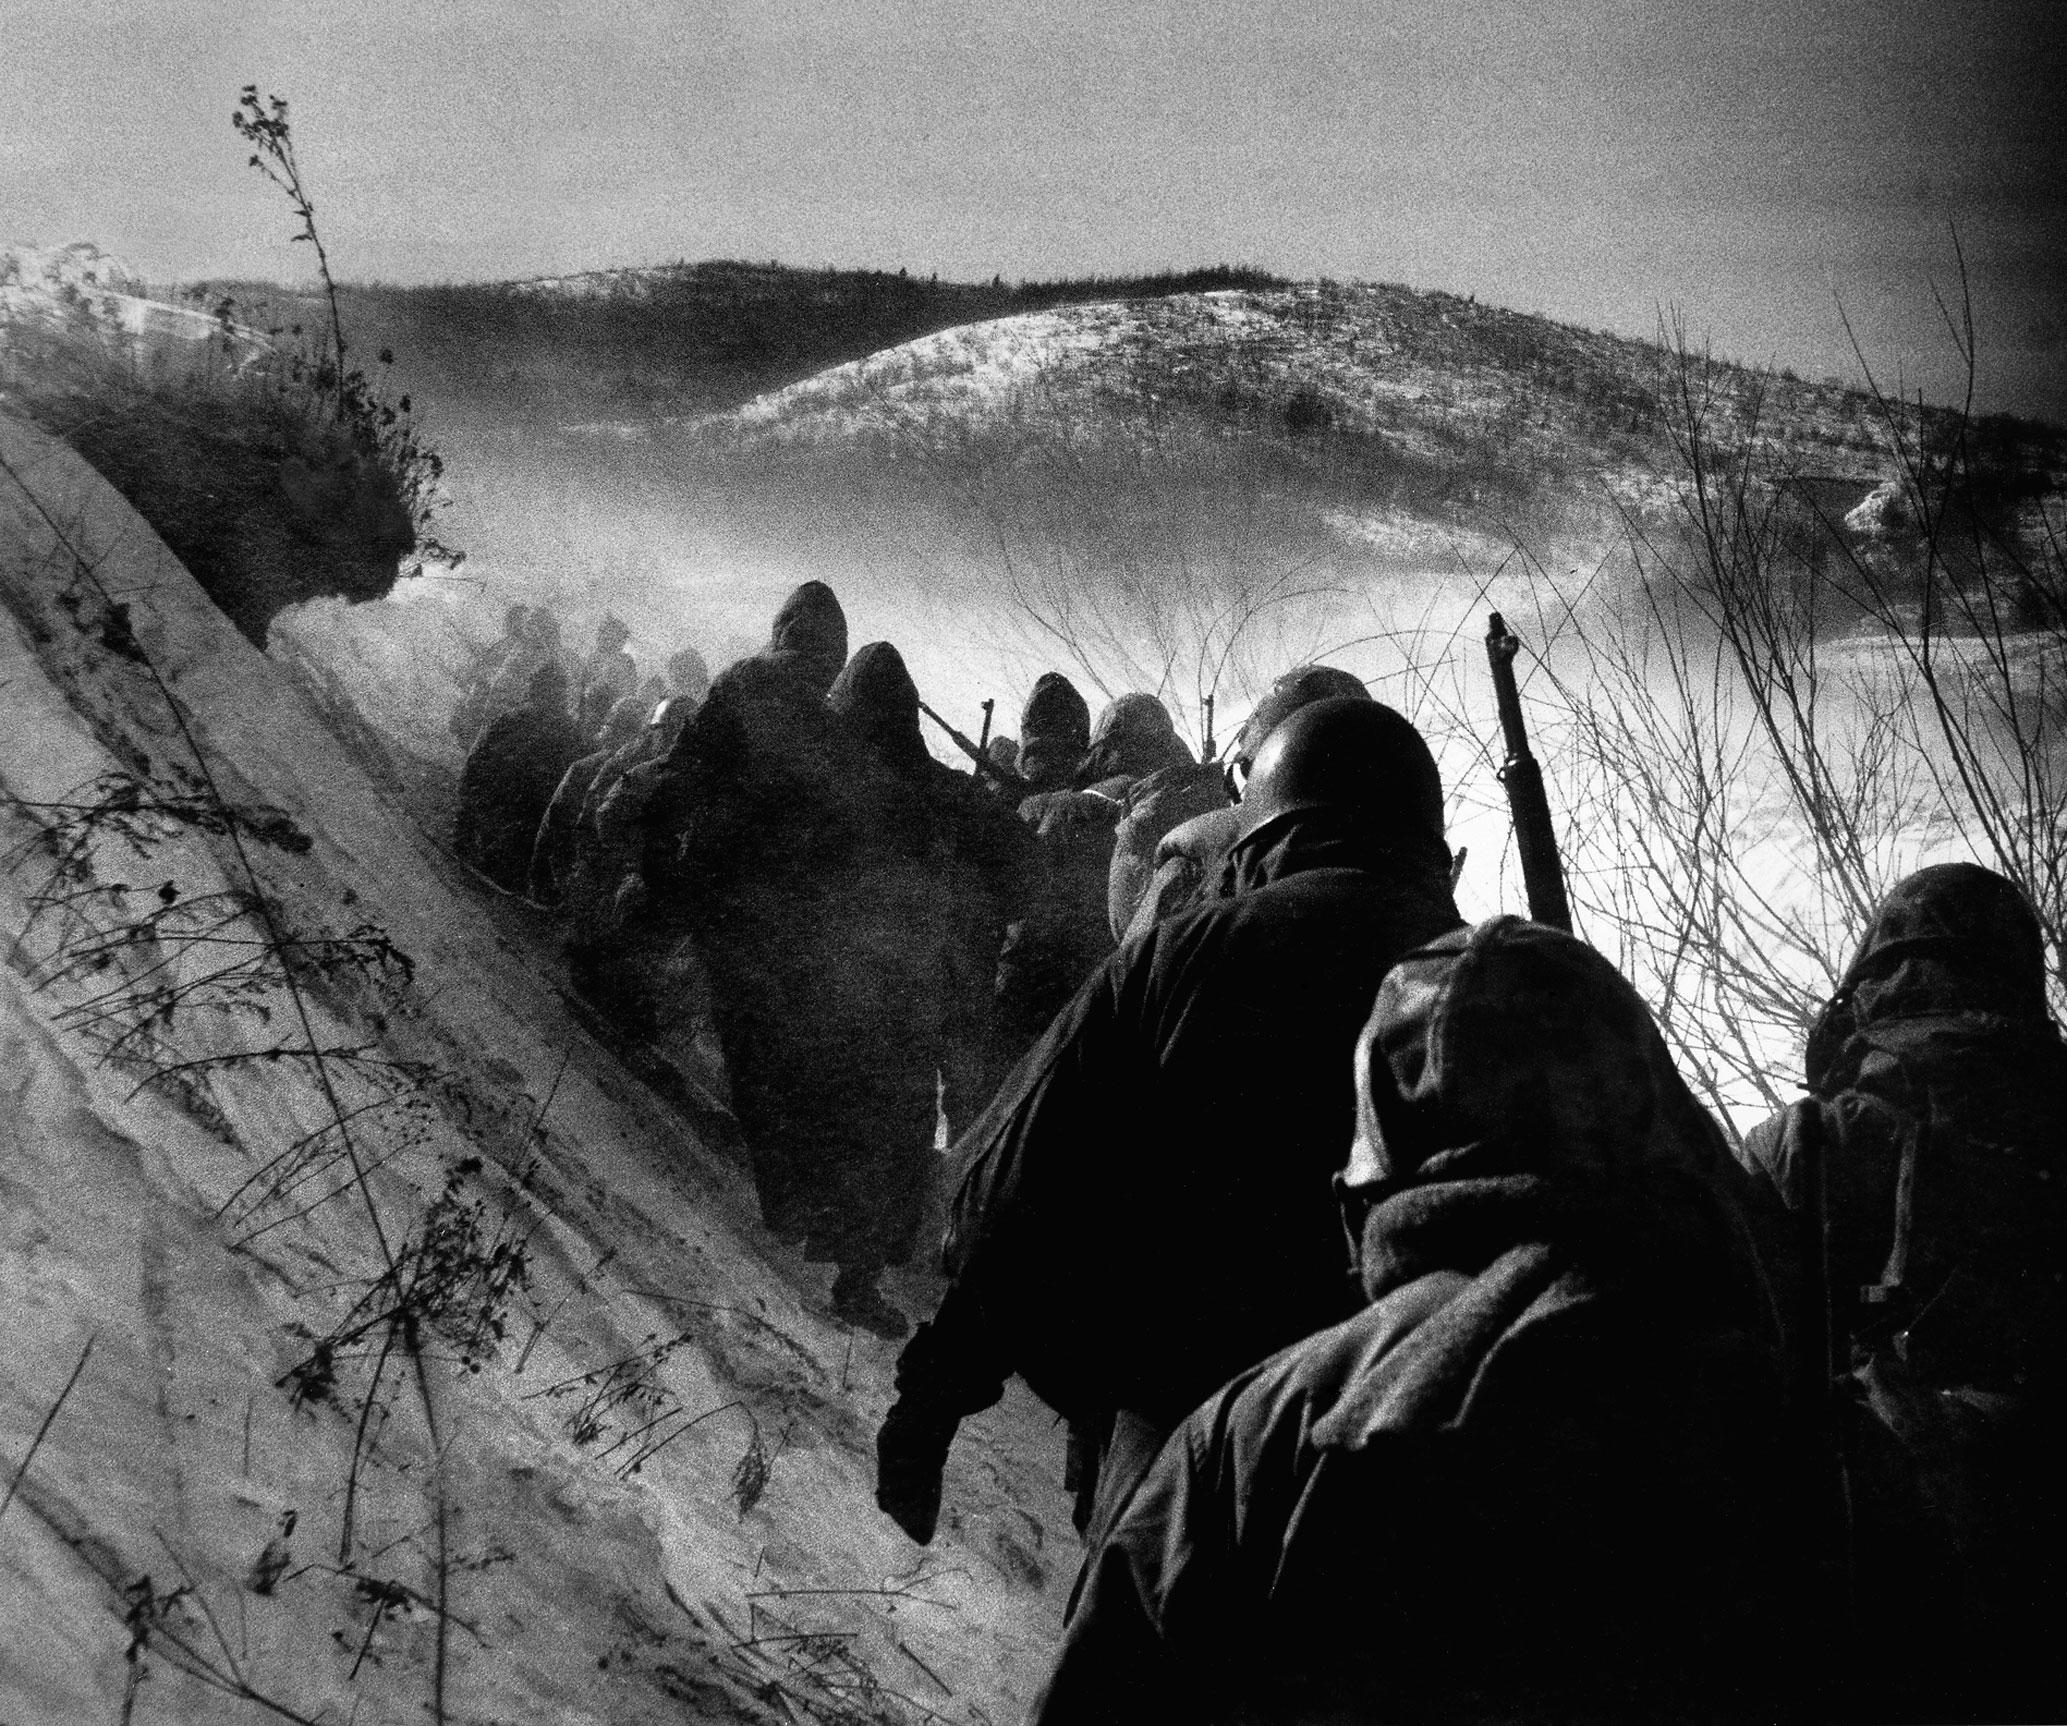 Marines retreat from the Chosin Reservoir, Korea, 1950.